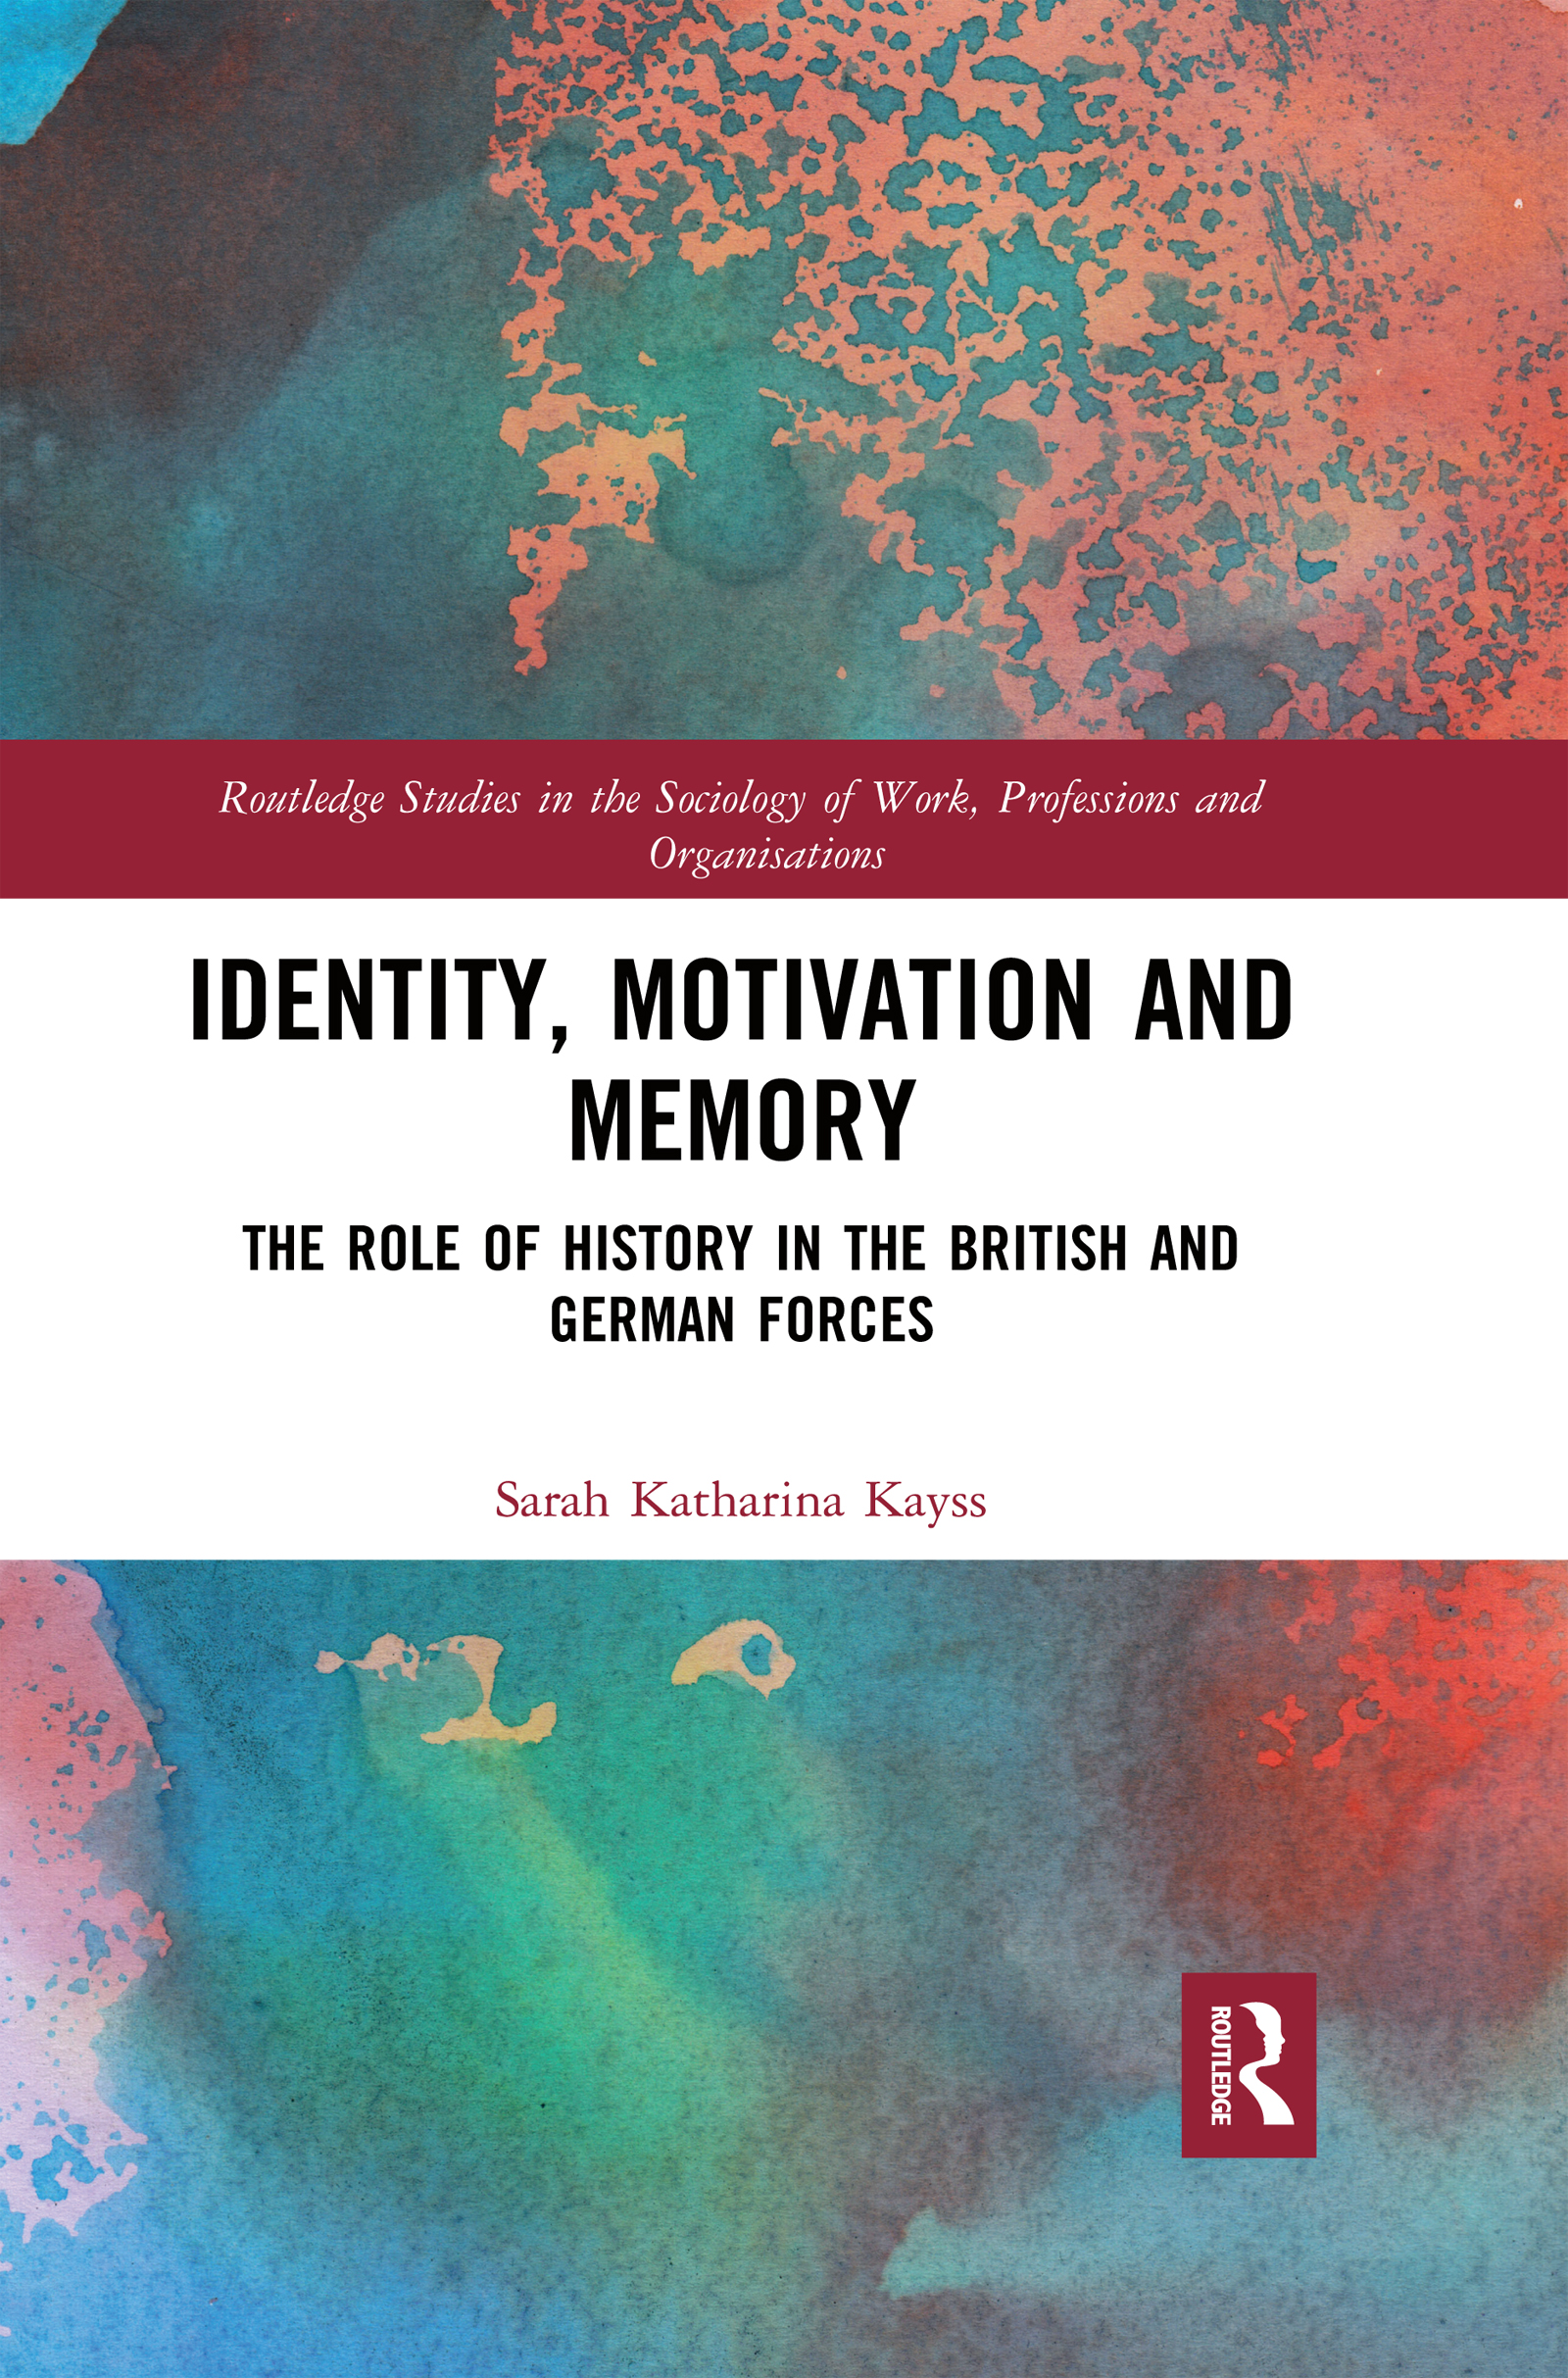 Identity, Motivation and Memory